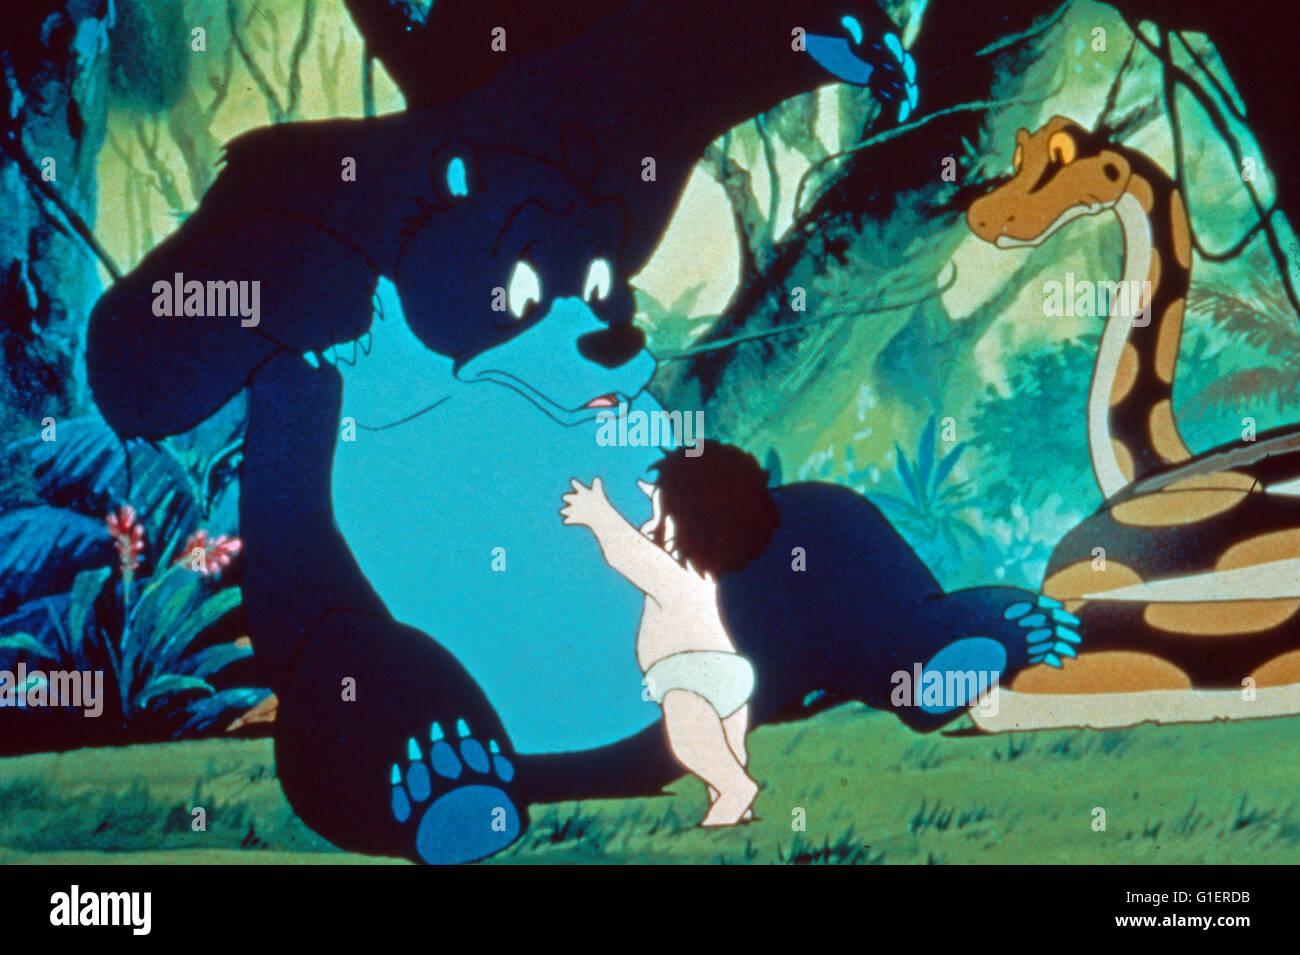 Jungle Book Shonen Mowgli, aka: Das Dschungelbuch, Zeichentrickserie, Japan 1989, Charakter: Mowgli, Bär Balu - Stock Image